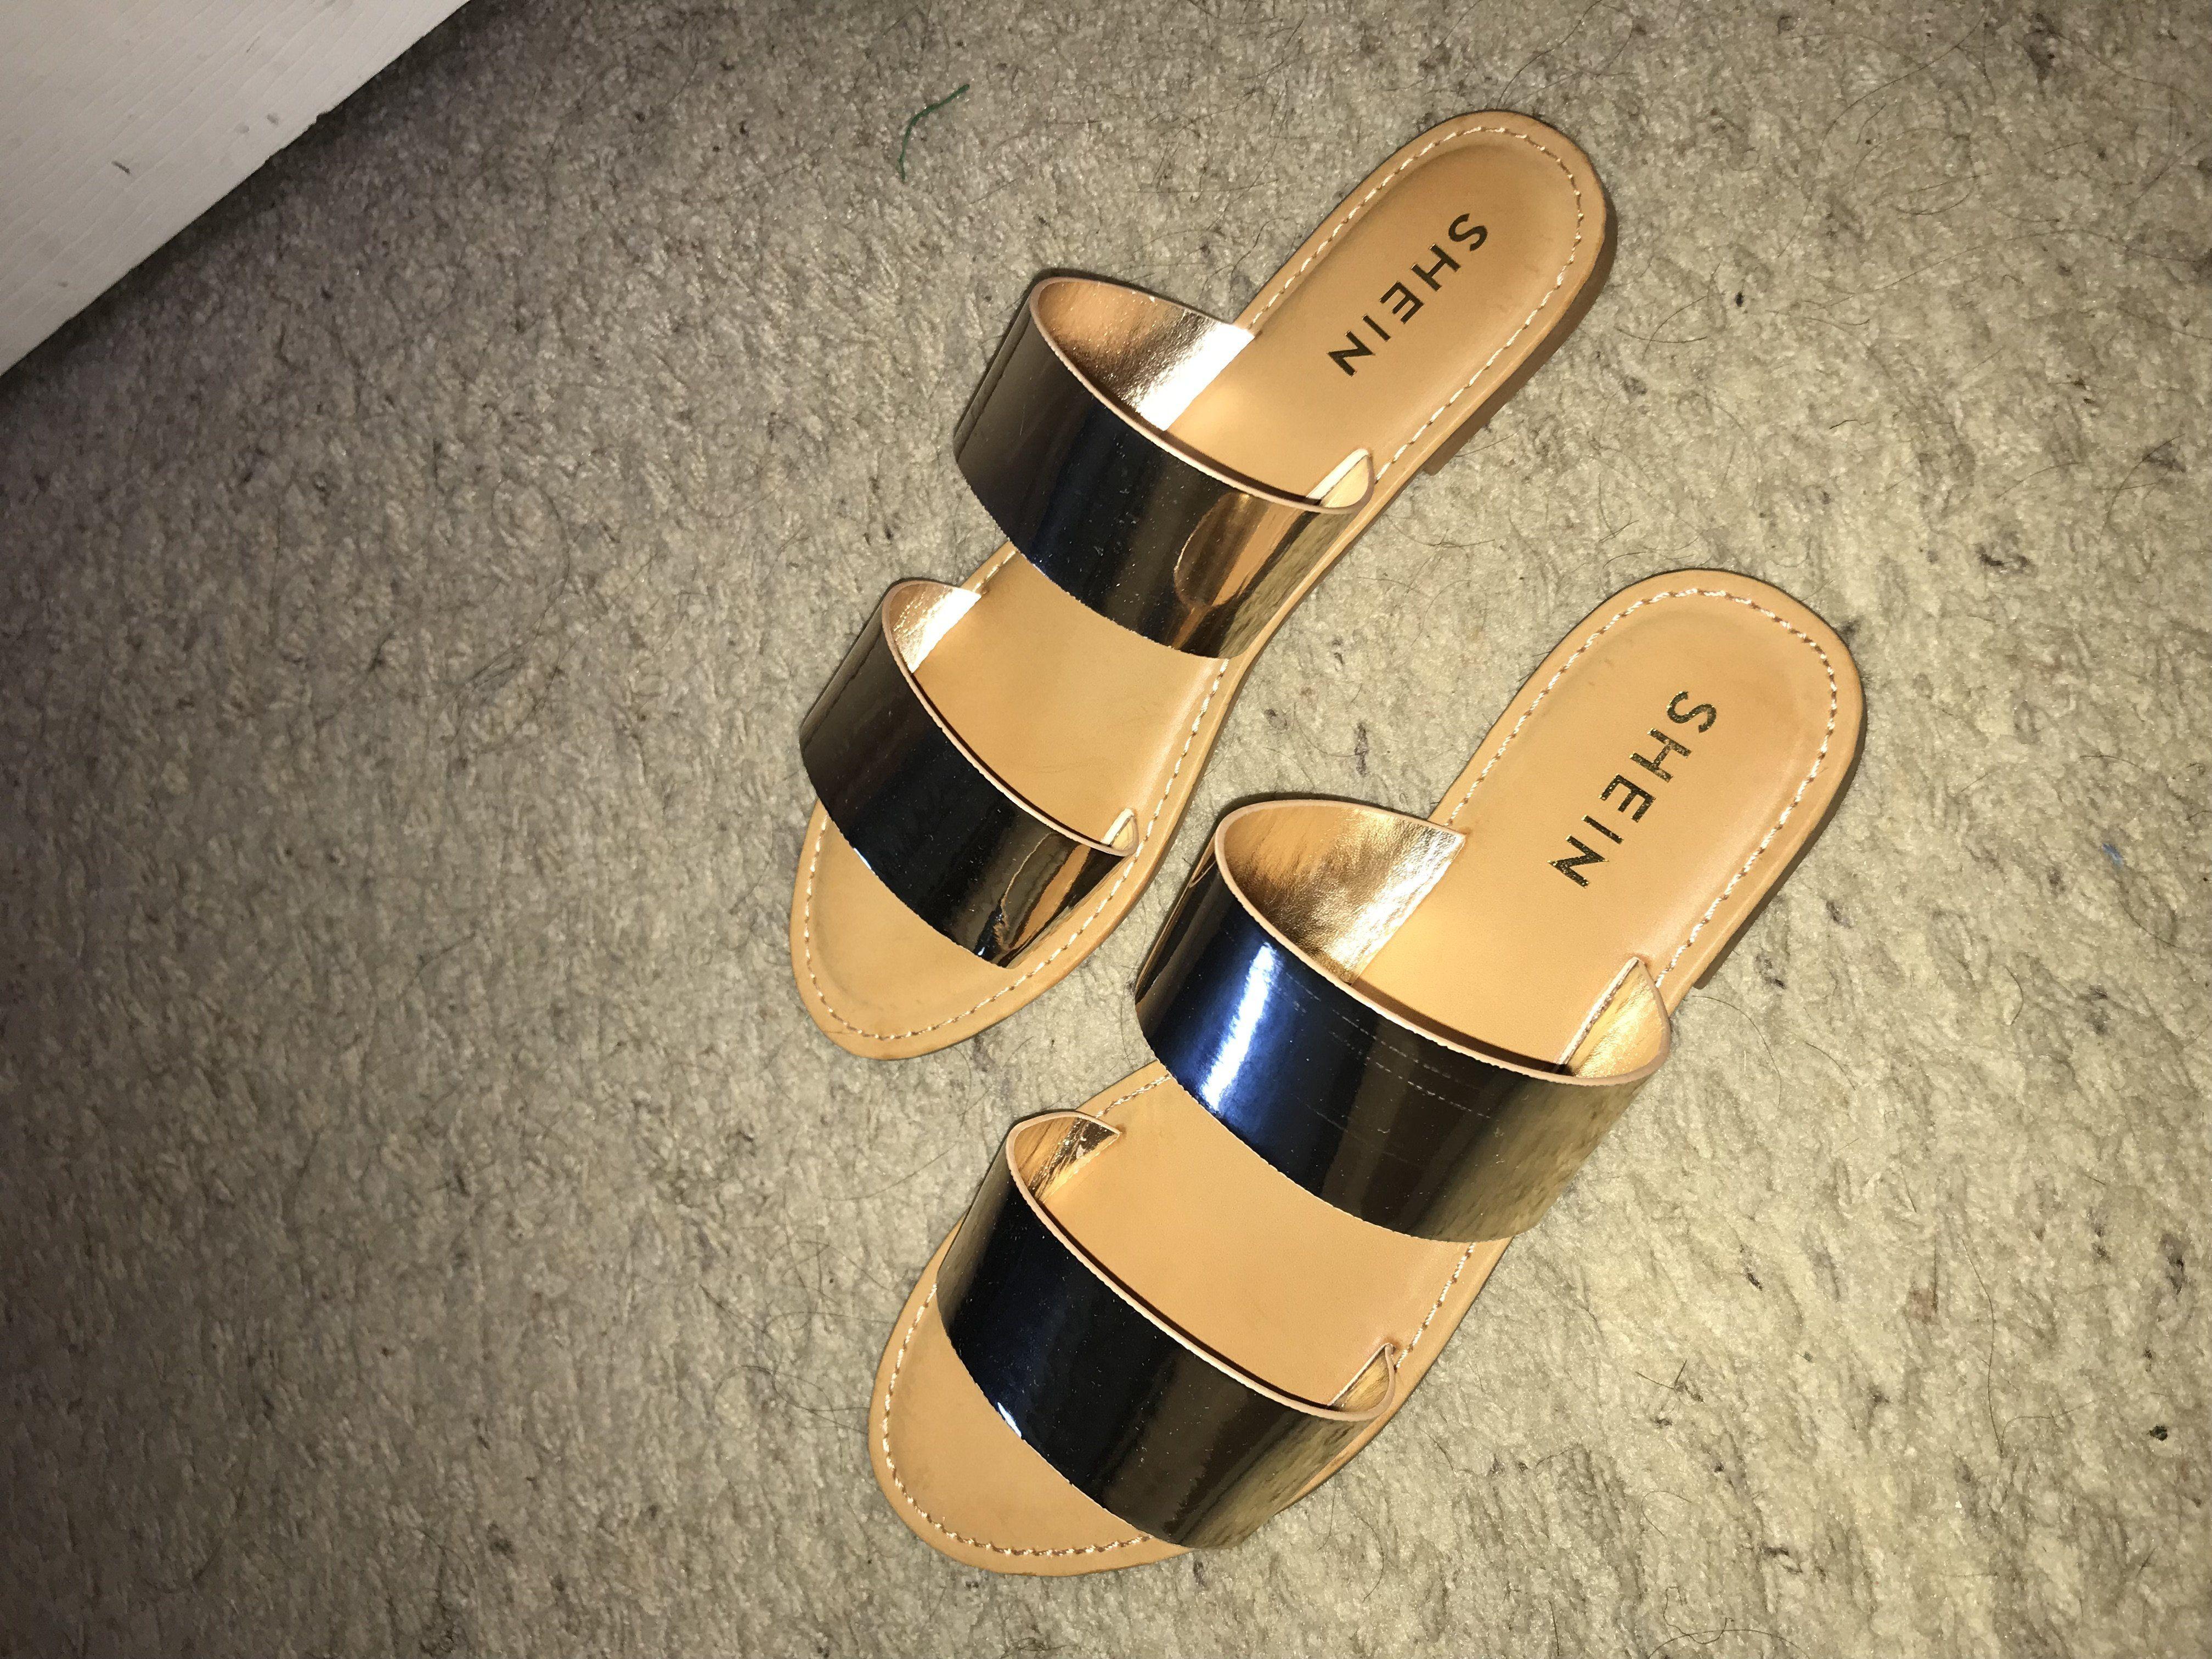 bcbfca487e35 Casual Peep Toe Gold Low Heel Metallic Duo Strap Sandals GOLD ...